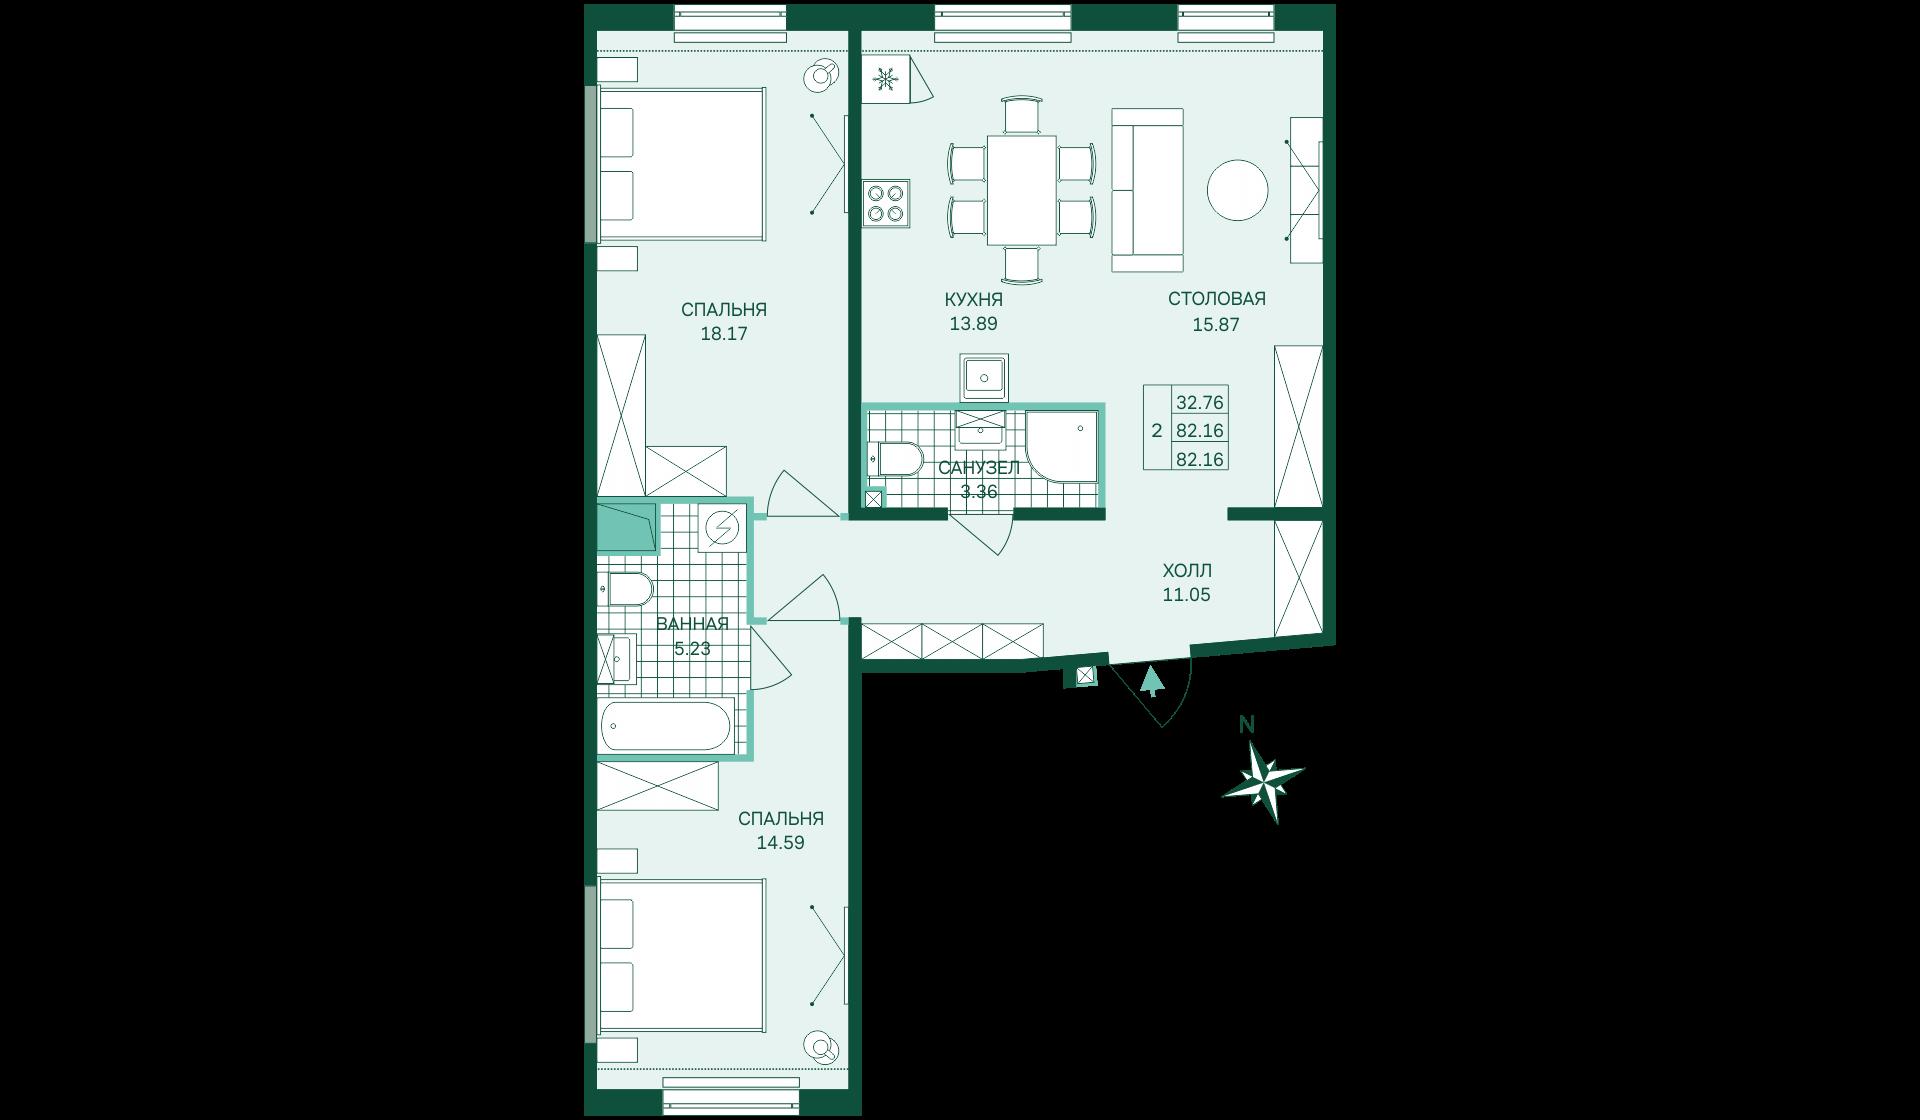 Планировка Двухкомнатная квартира площадью 82.16 кв.м в ЖК «Skandi Klubb»